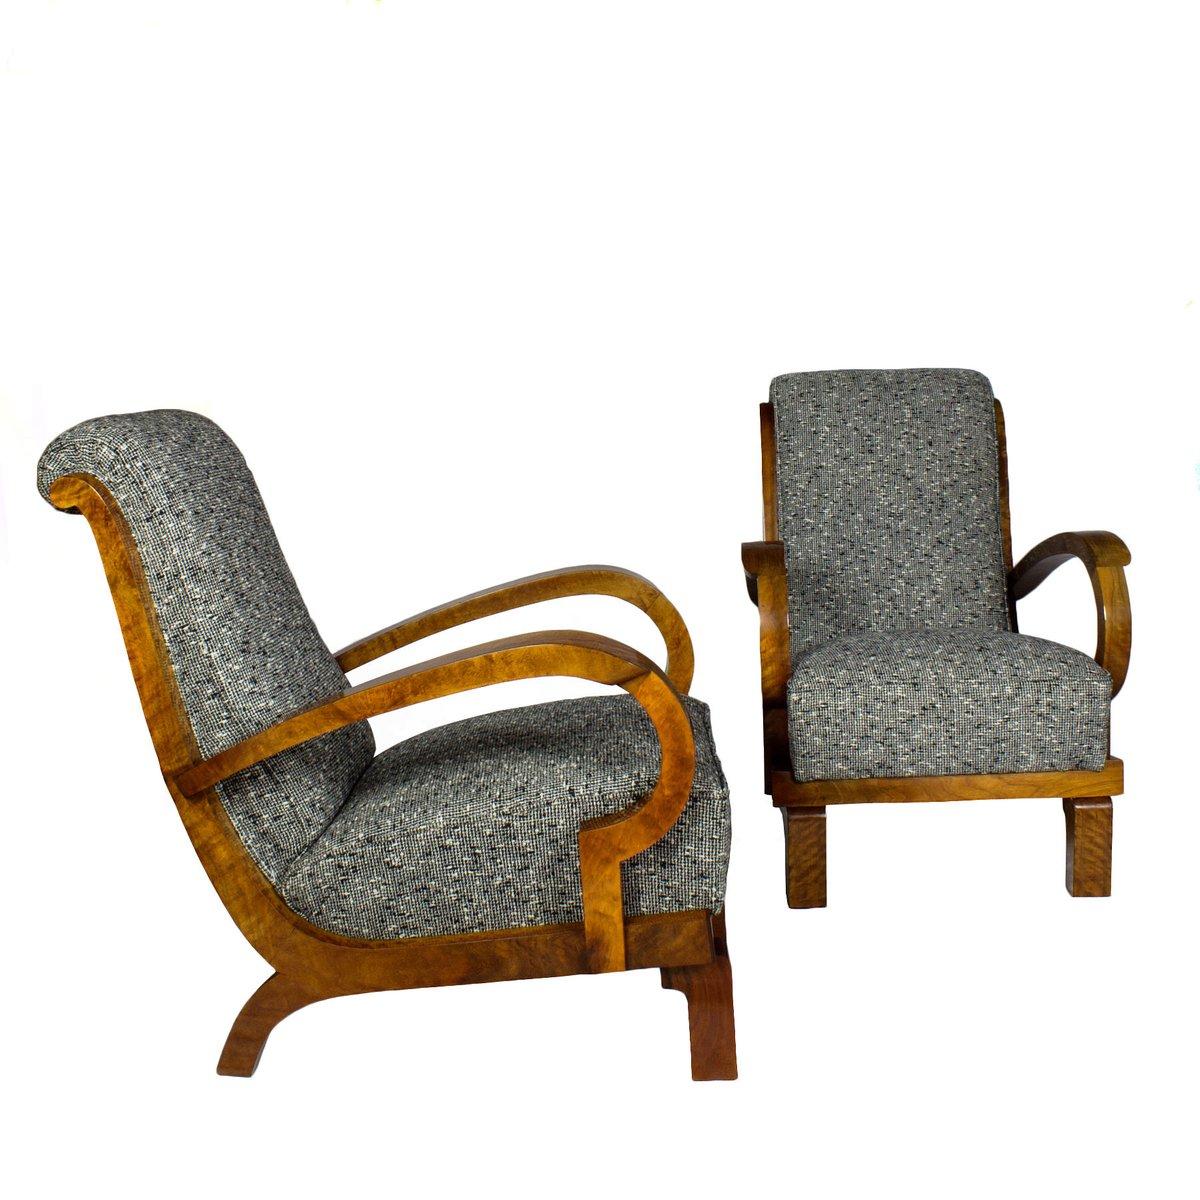 italienische art deco sessel 1930 2er set bei pamono kaufen. Black Bedroom Furniture Sets. Home Design Ideas